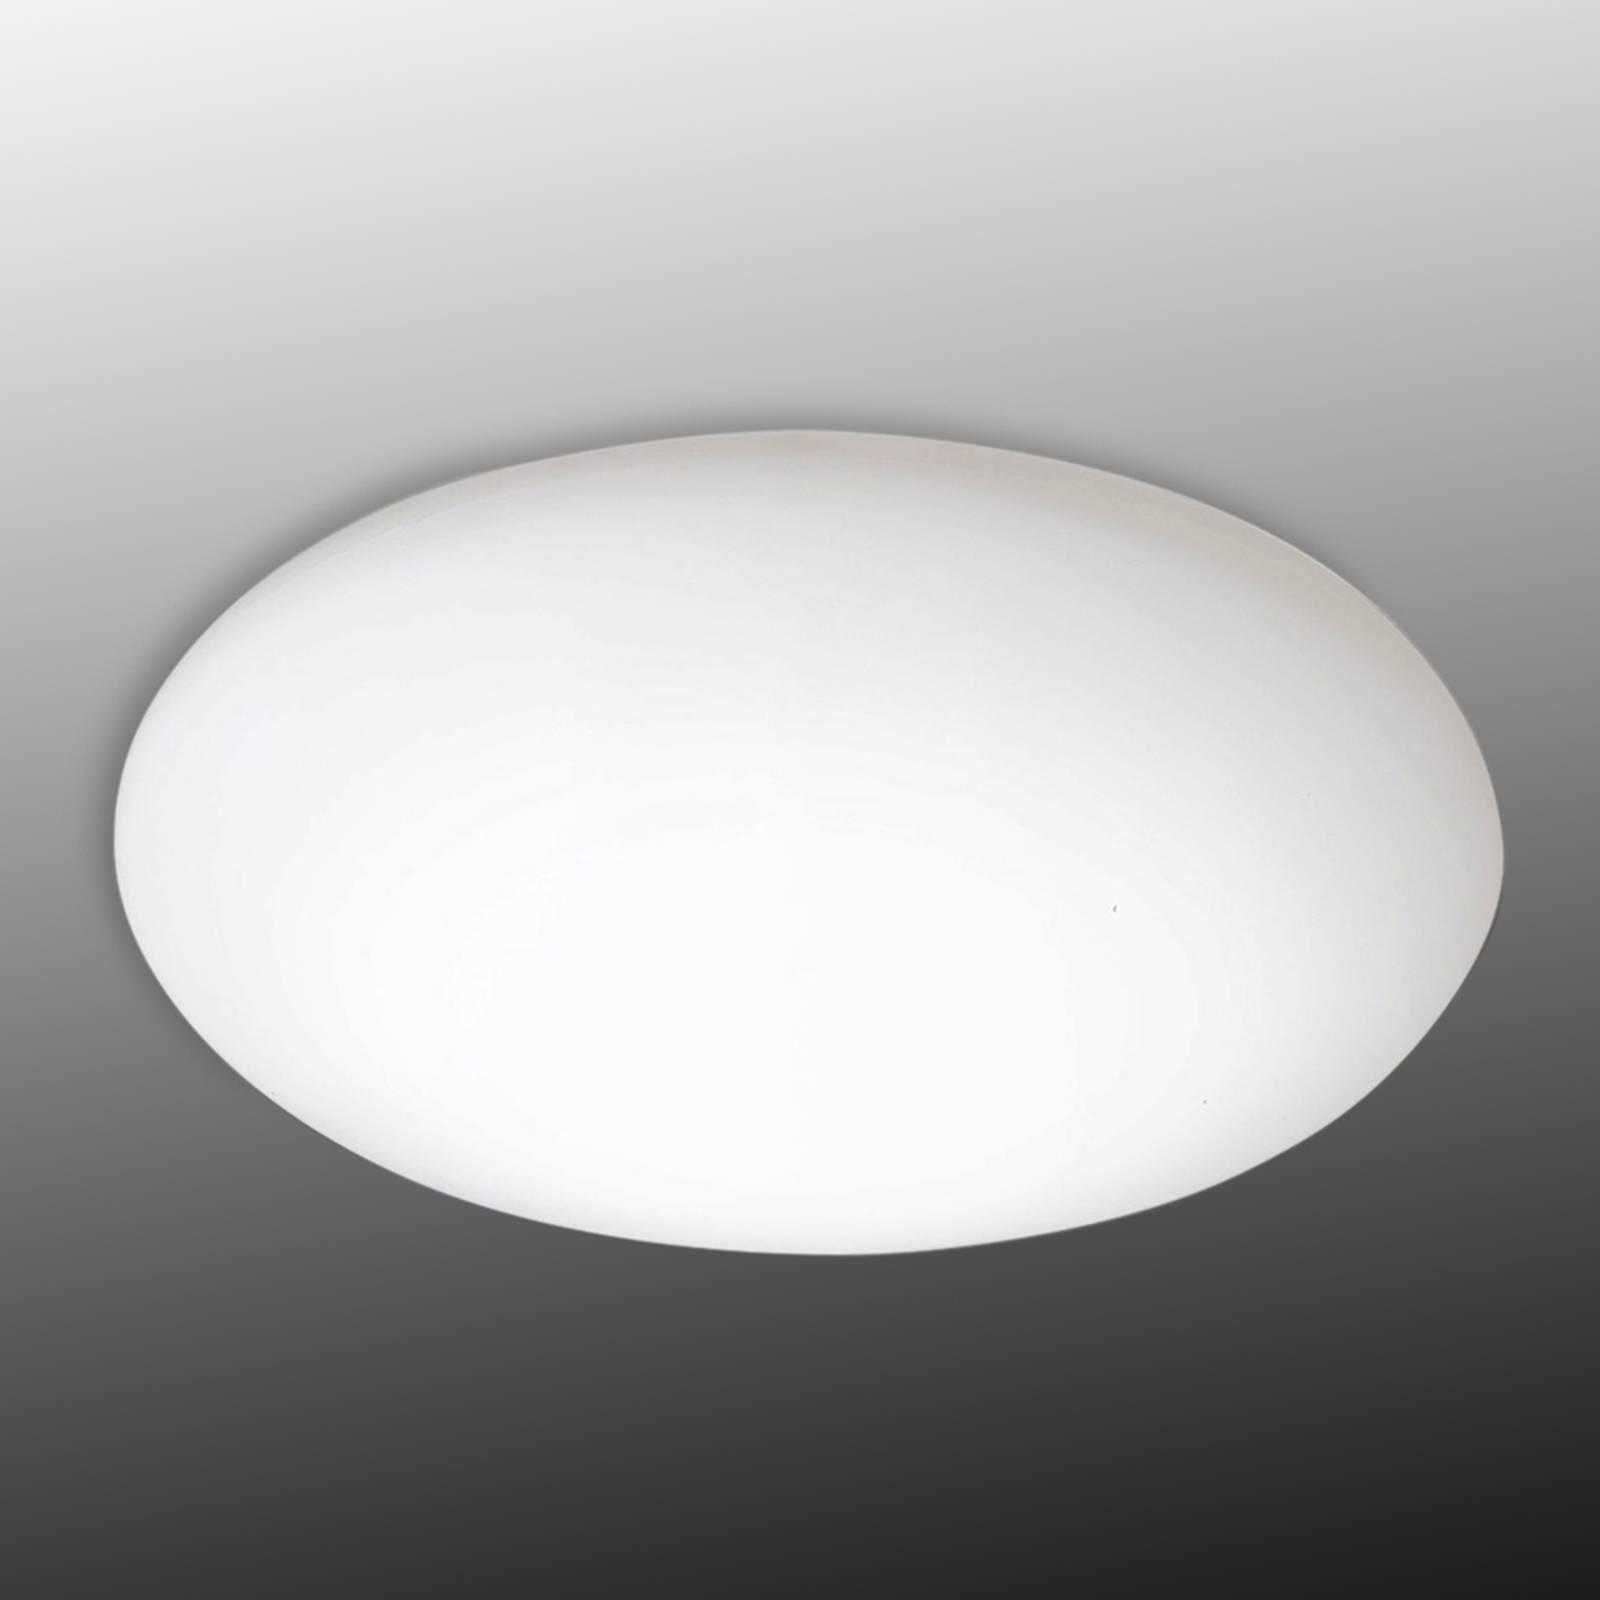 Lampa sufitowa LED SQUASH z polietylenu